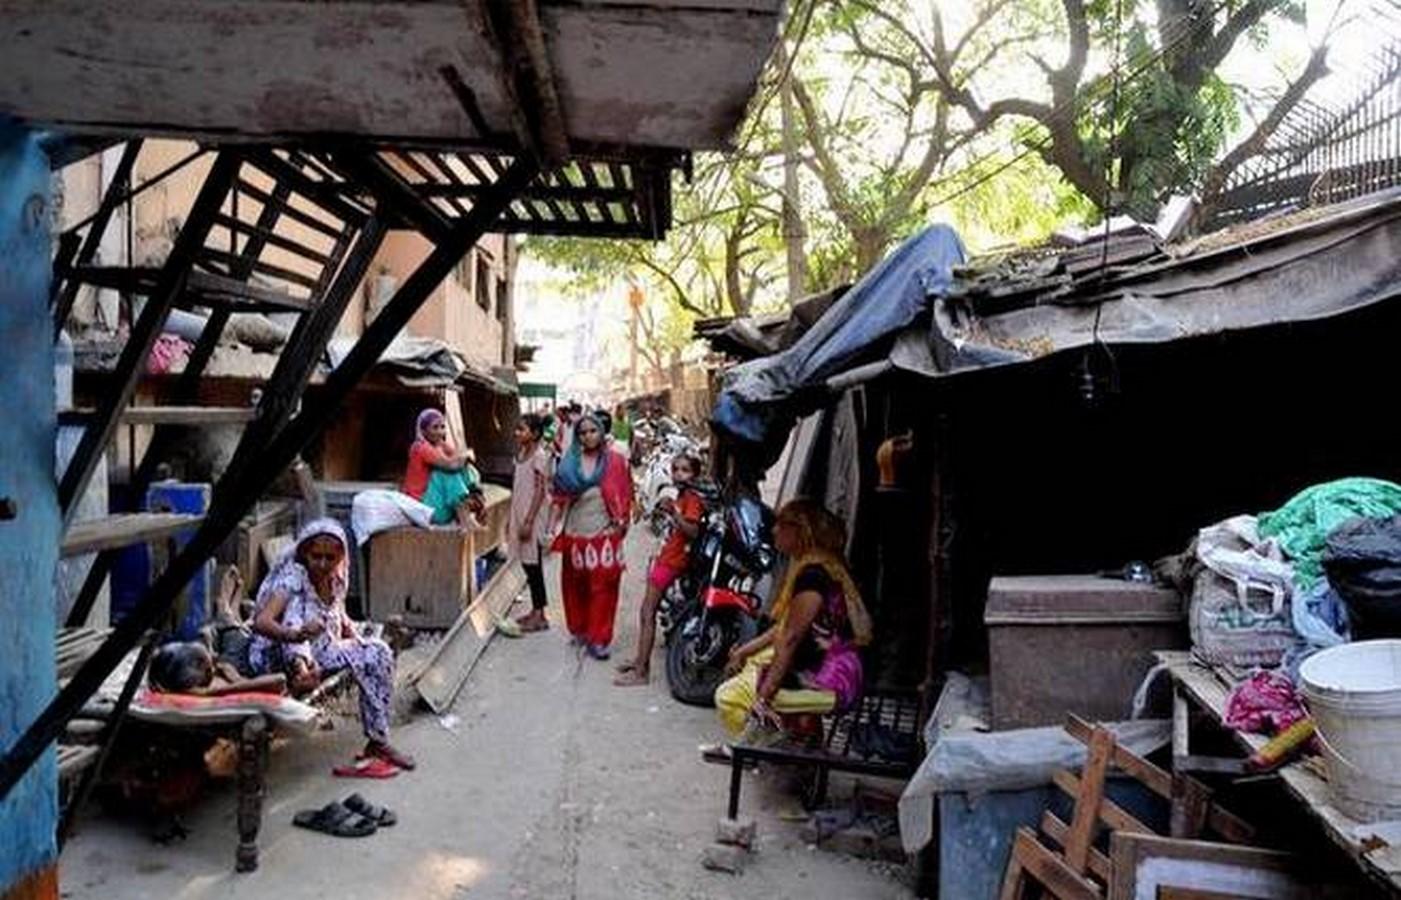 The socio-cultural imapct of slums in cities - Sheet5